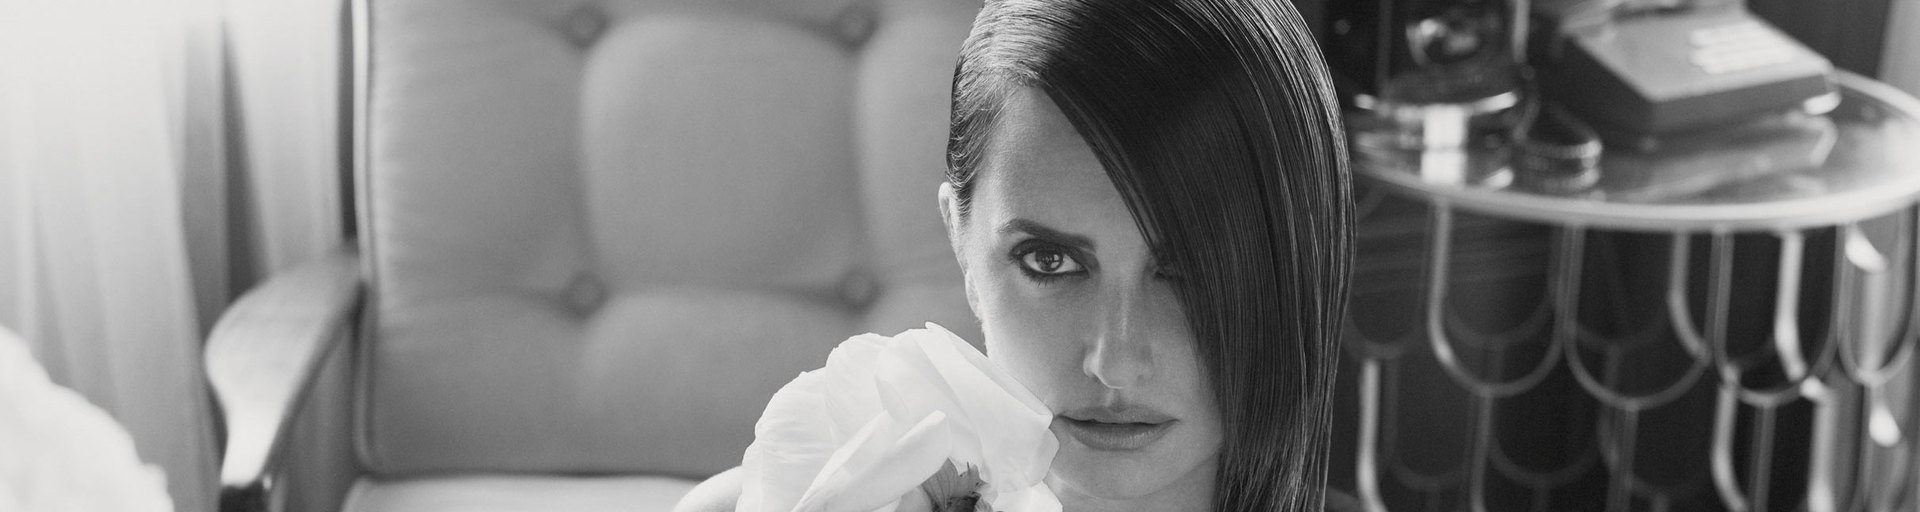 Пенелопа Крус:                                                                                           «Я настоящая испанка»